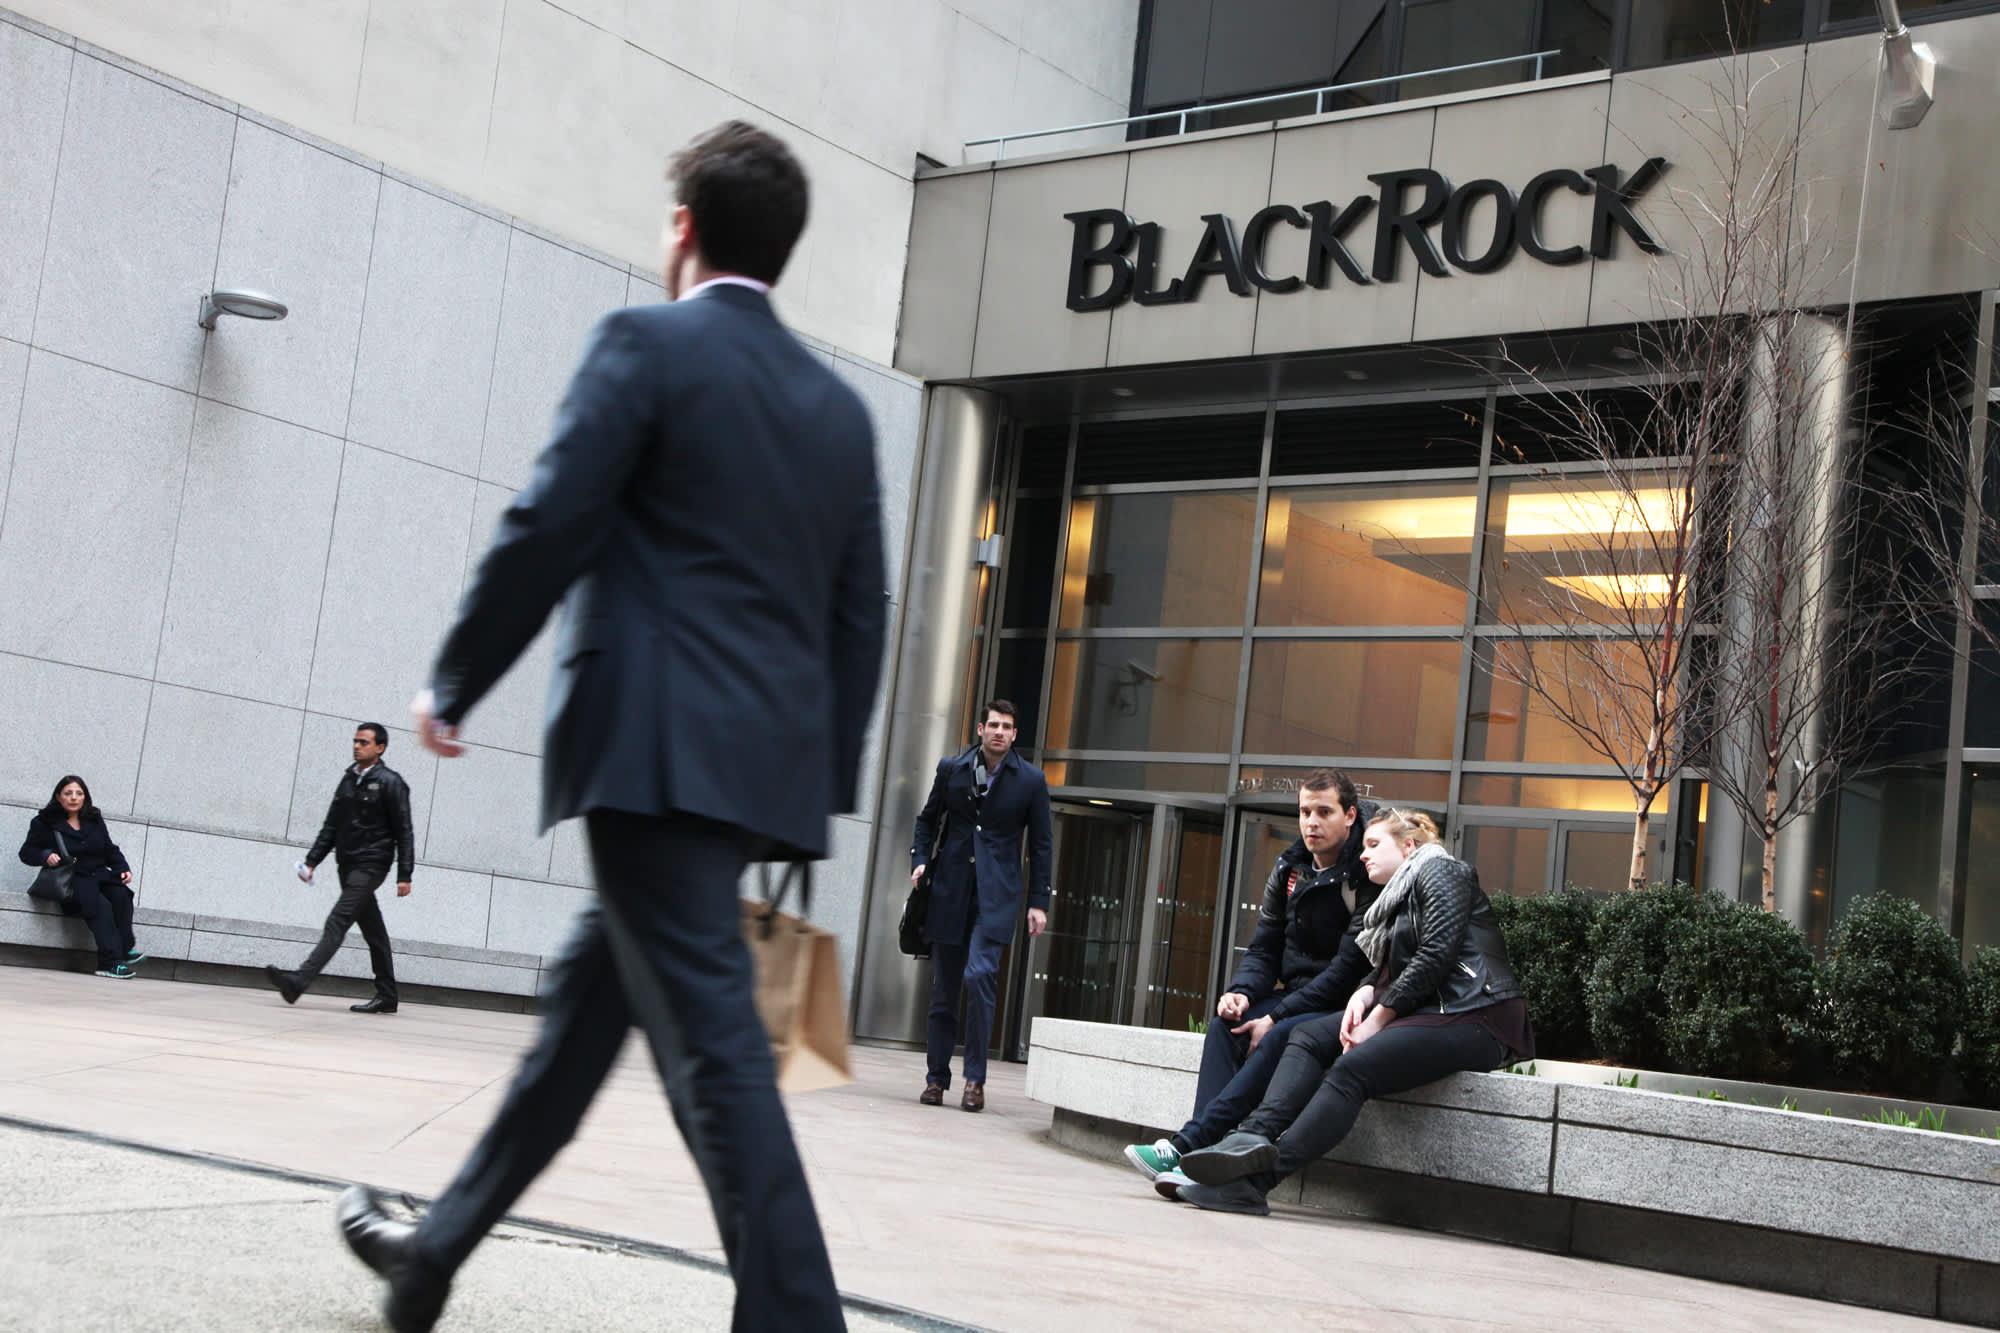 Jpmorgans Top Financial Stocks To Buy For 2018 Include Blackrock